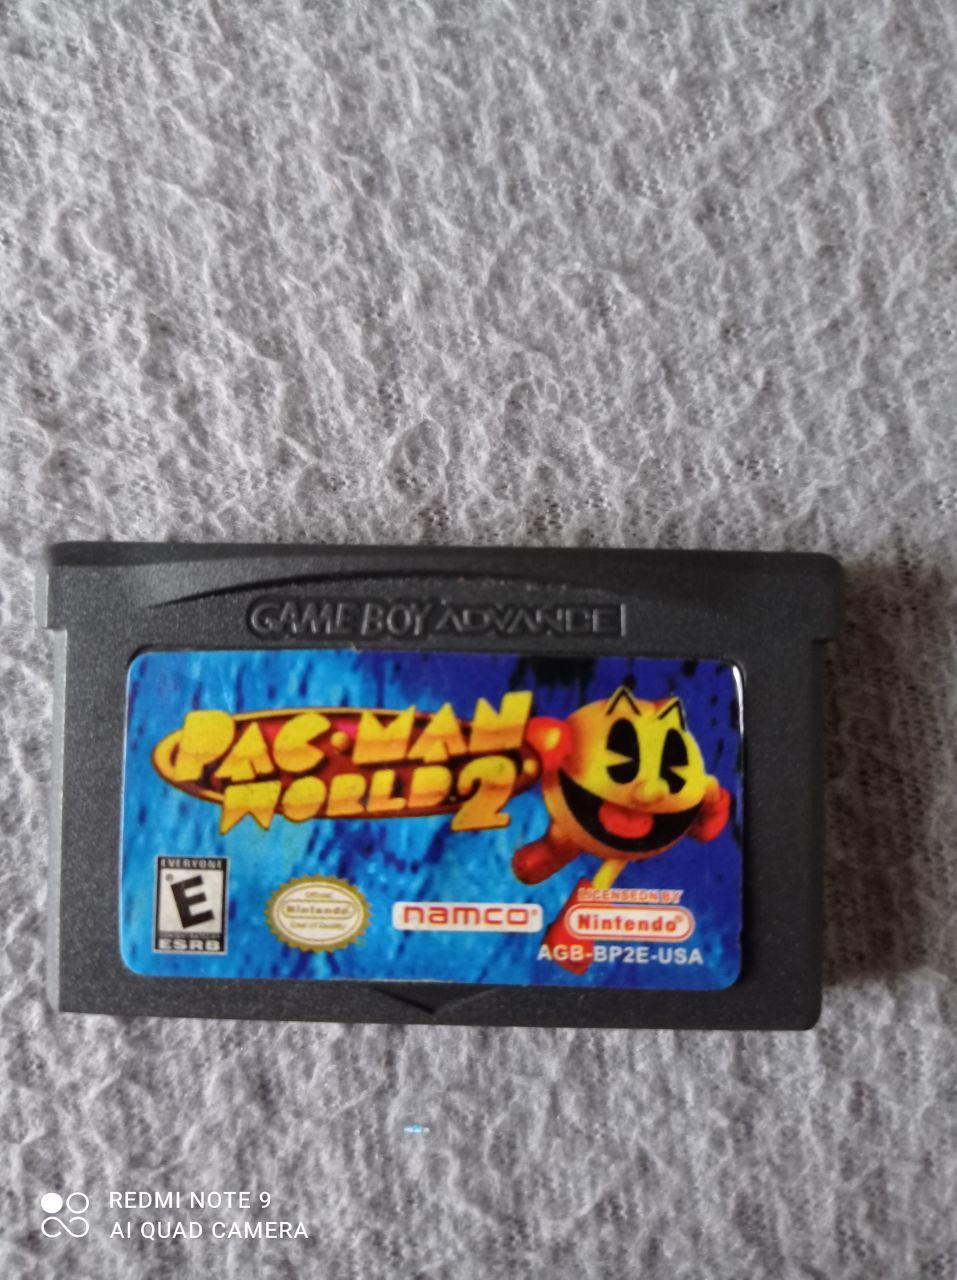 Image article Nintendo - Game Boy Advance - Pac-Man world 2